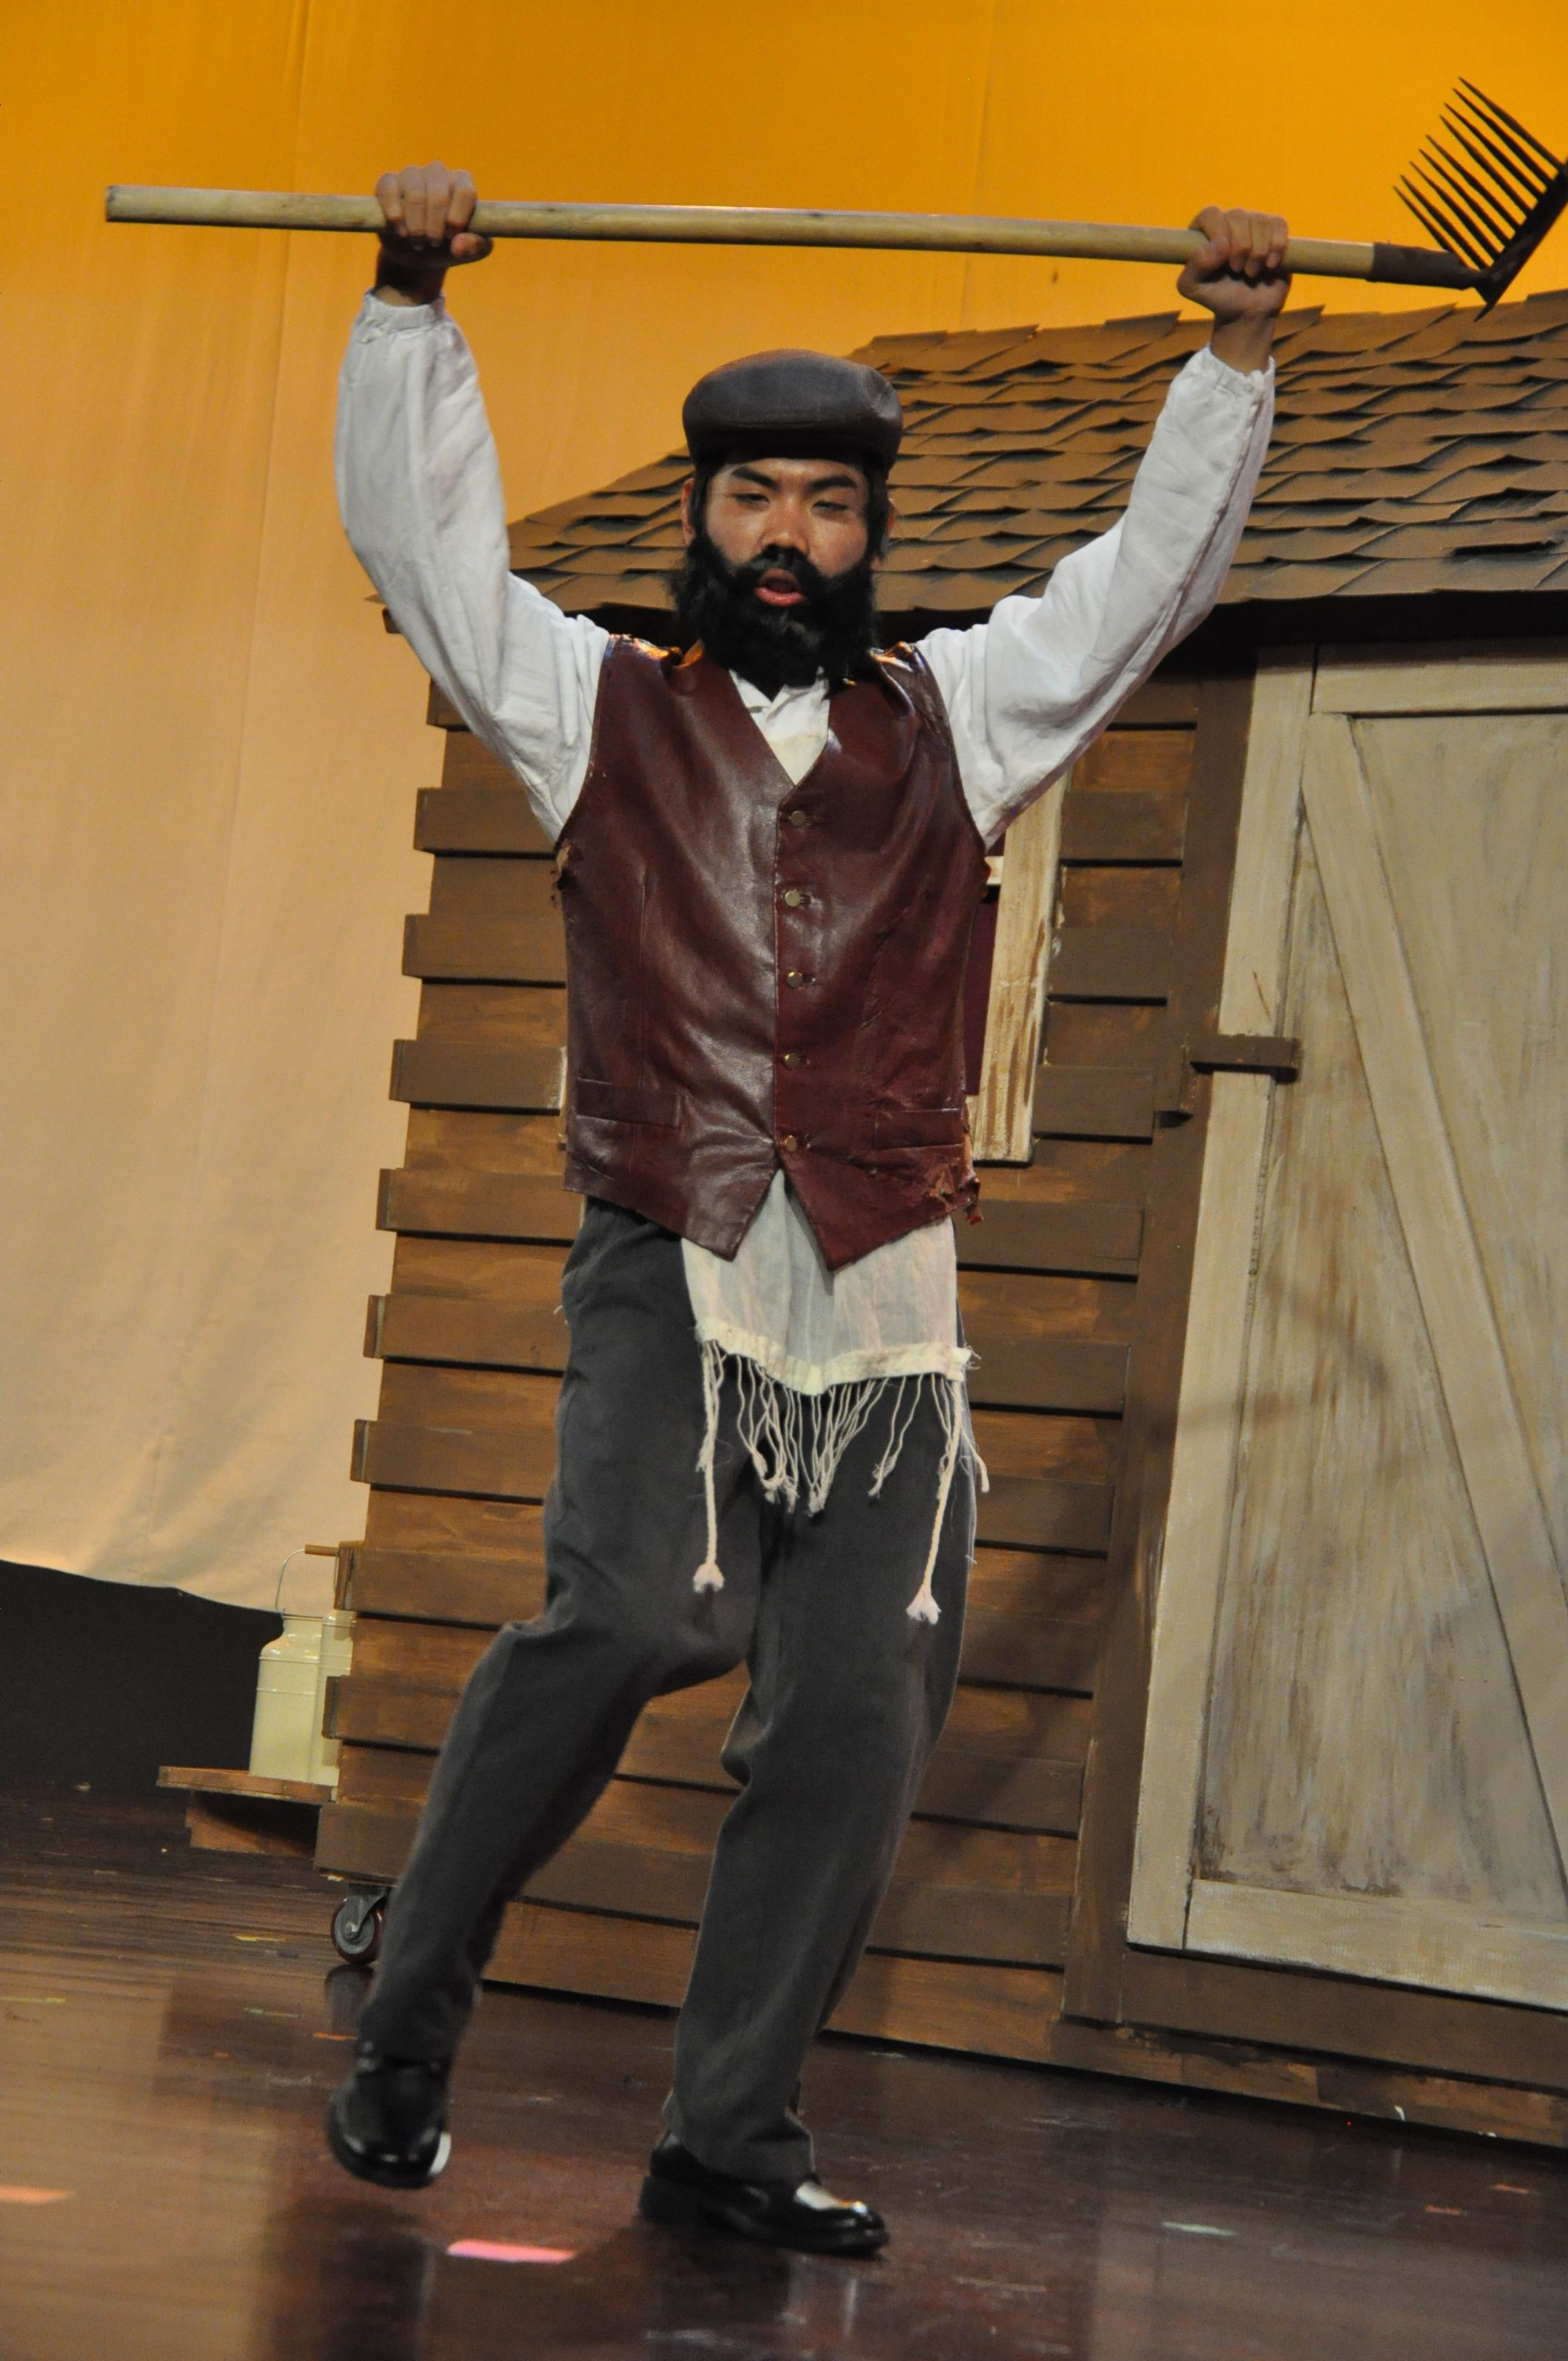 Tevye Beijing National Day School Production Of Fiddler On The Roof 2014 Fiddler On The Roof Fiddler Roof